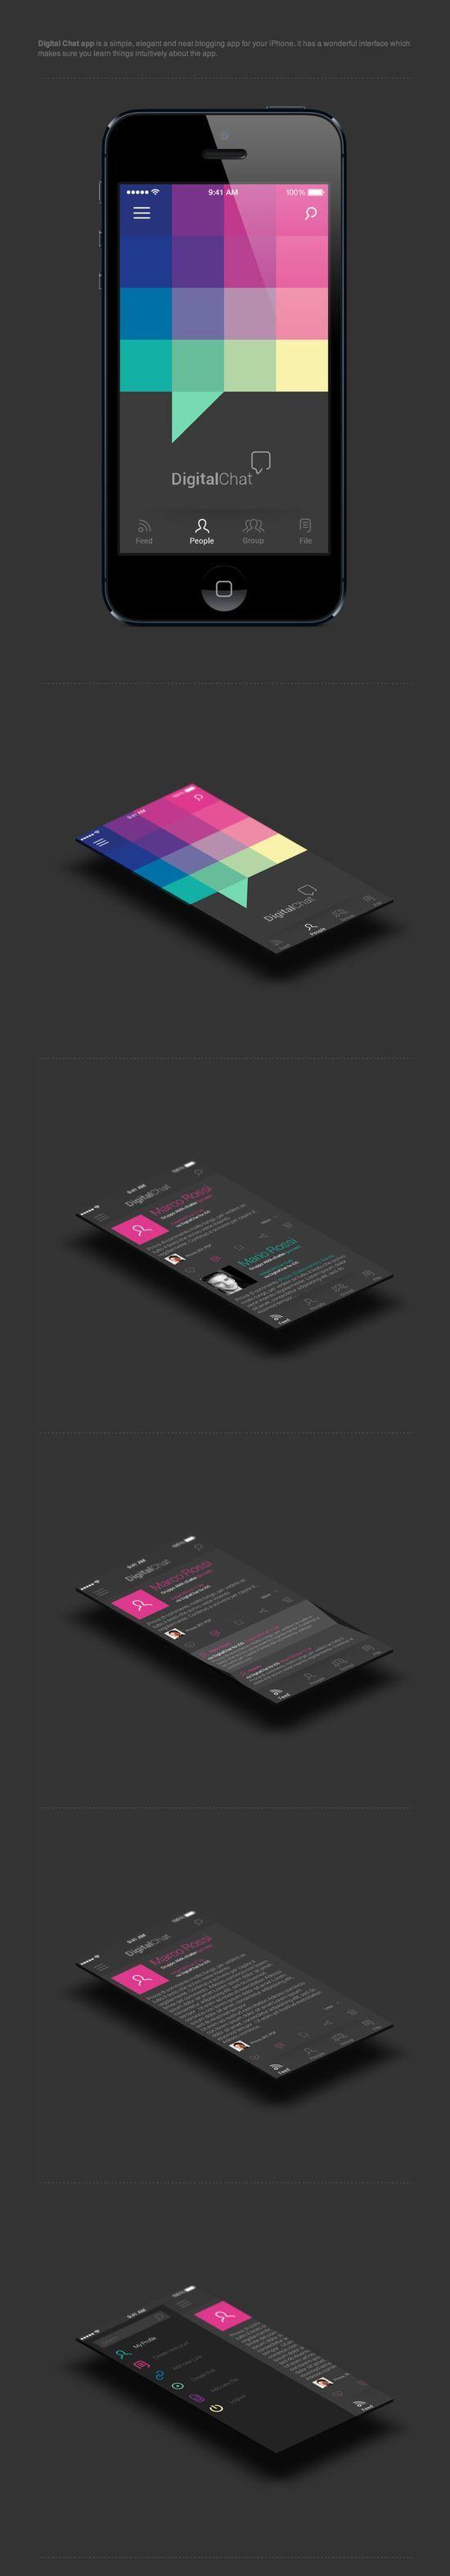 Digital Chat - #UI #UX #Interface #Mobile -   http://uidesigninspirations.blogspot.com